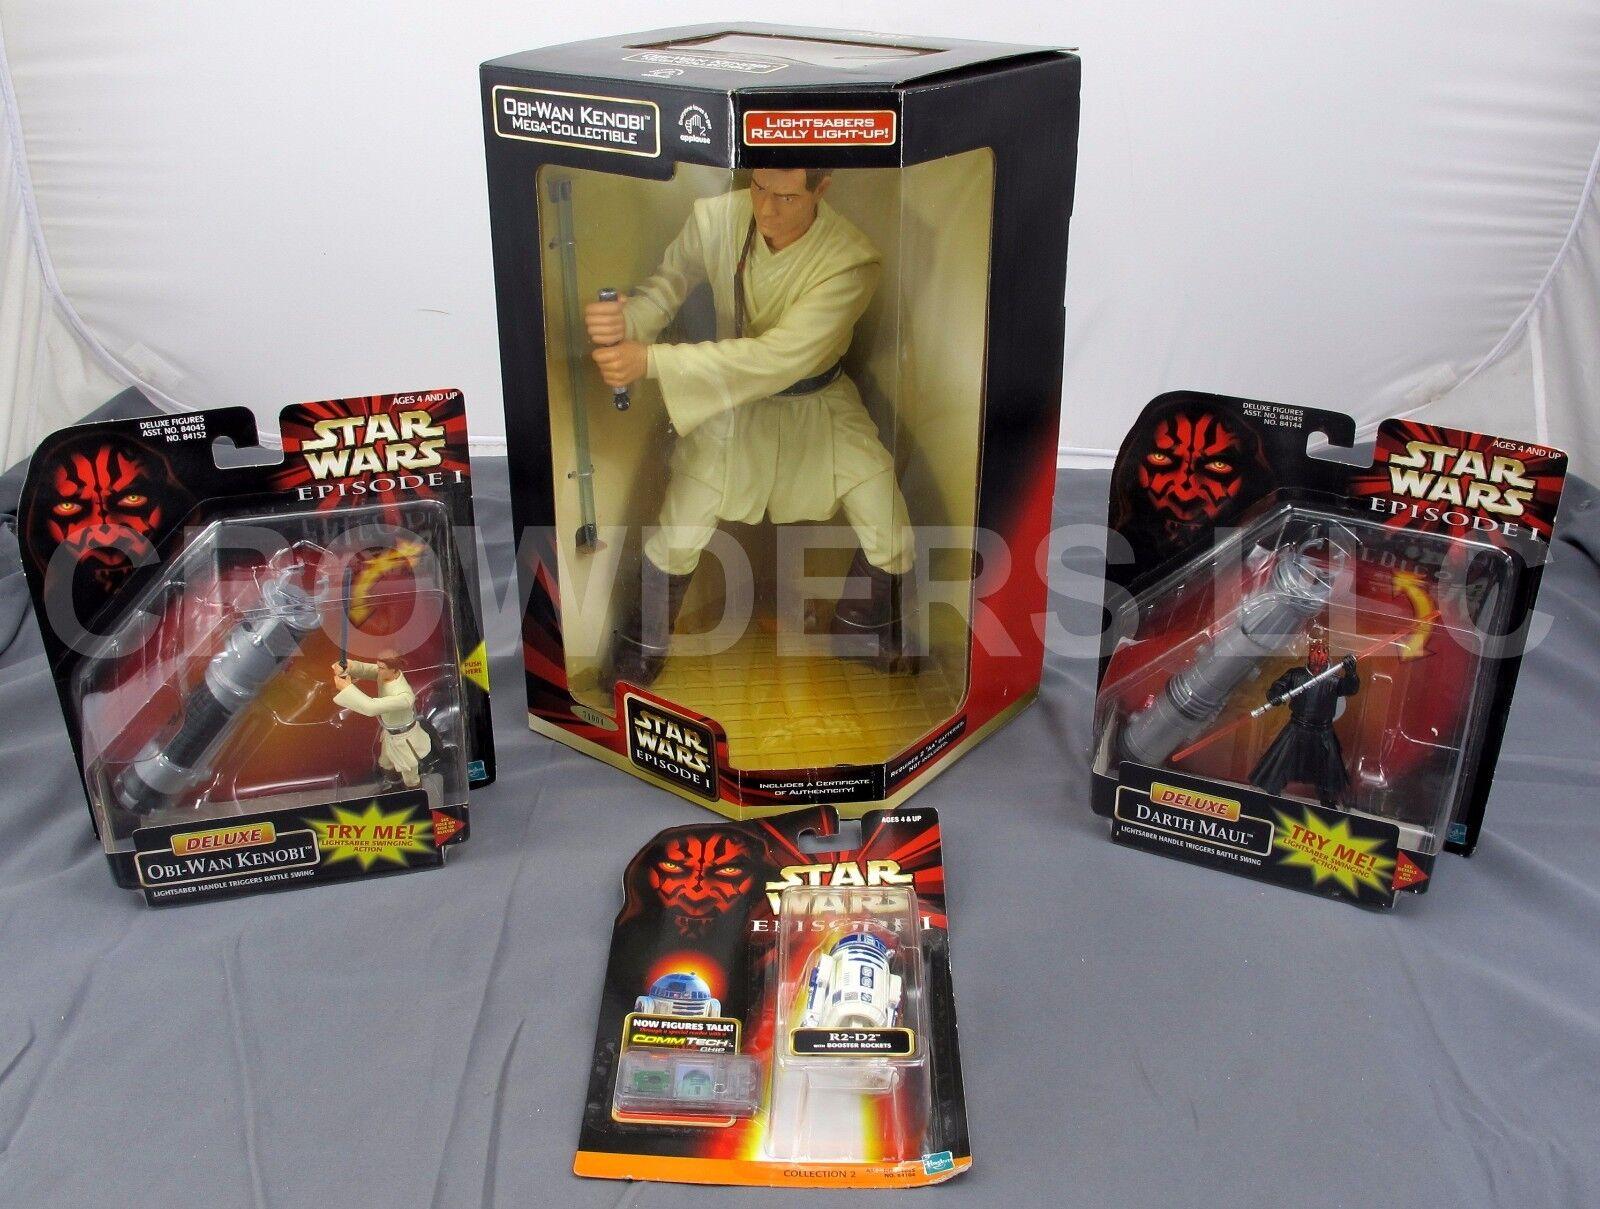 Star Wars Obi Wan Kenobi Mega Collectible Deluxe Darth Maul & OWK + R2D2 NIP '98